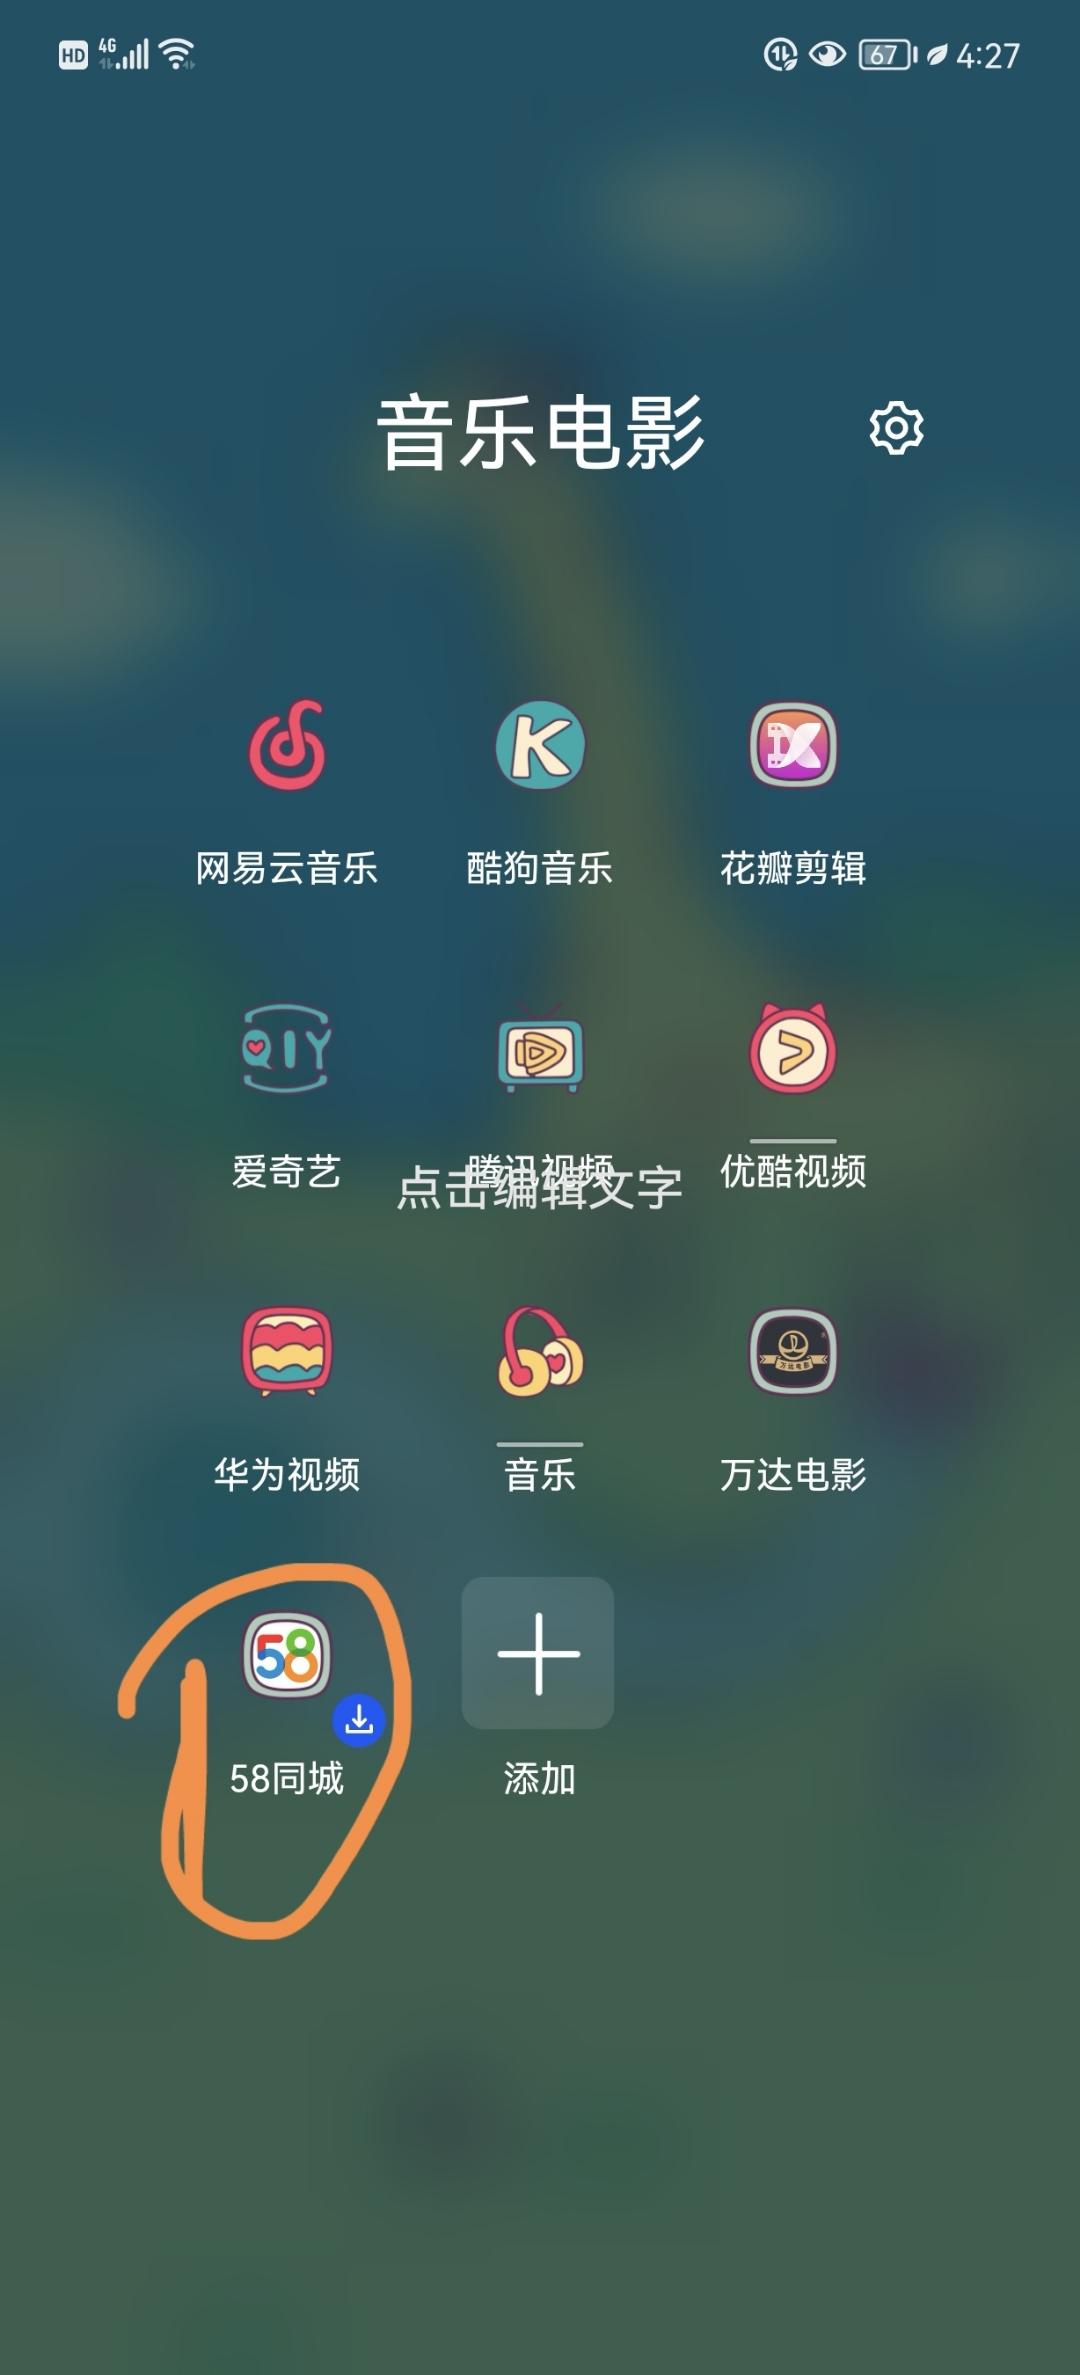 Screenshot_20210908_162757_com.huawei.android.launcher_edit_357245352624652.jpg